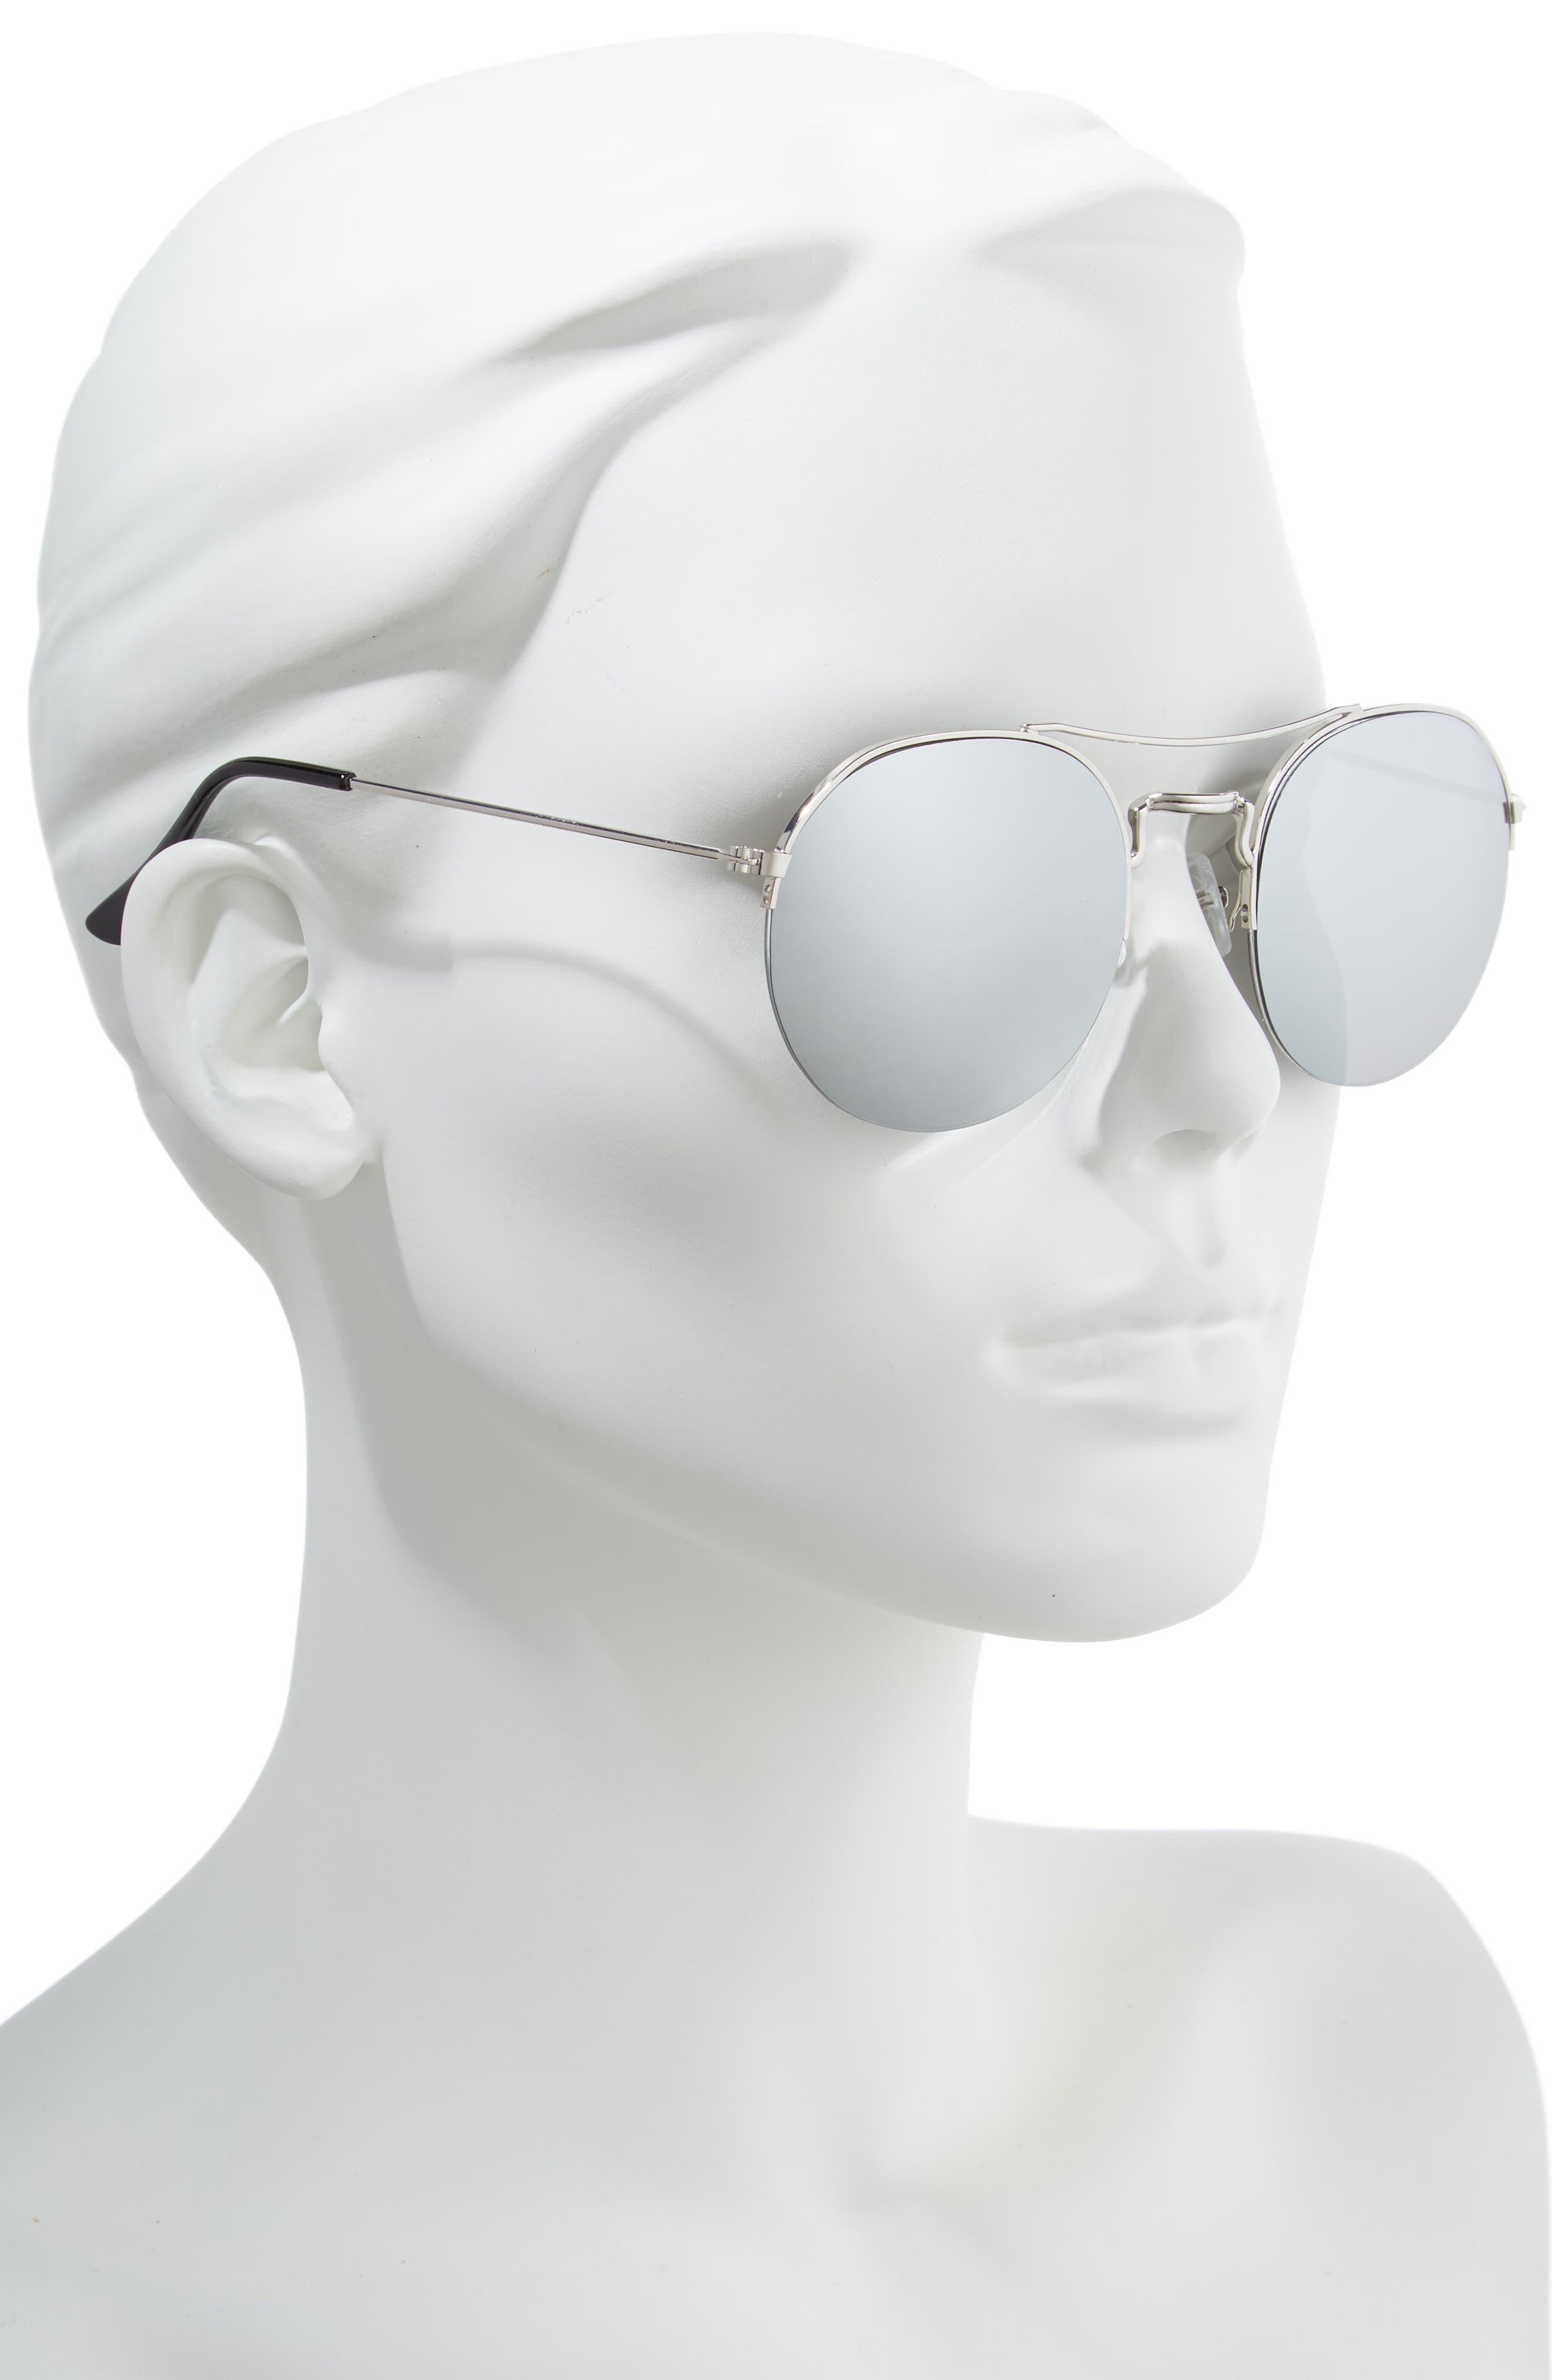 55mm Round Metal Aviator Sunglasses,                             Alternate thumbnail 2, color,                             DARK GREY